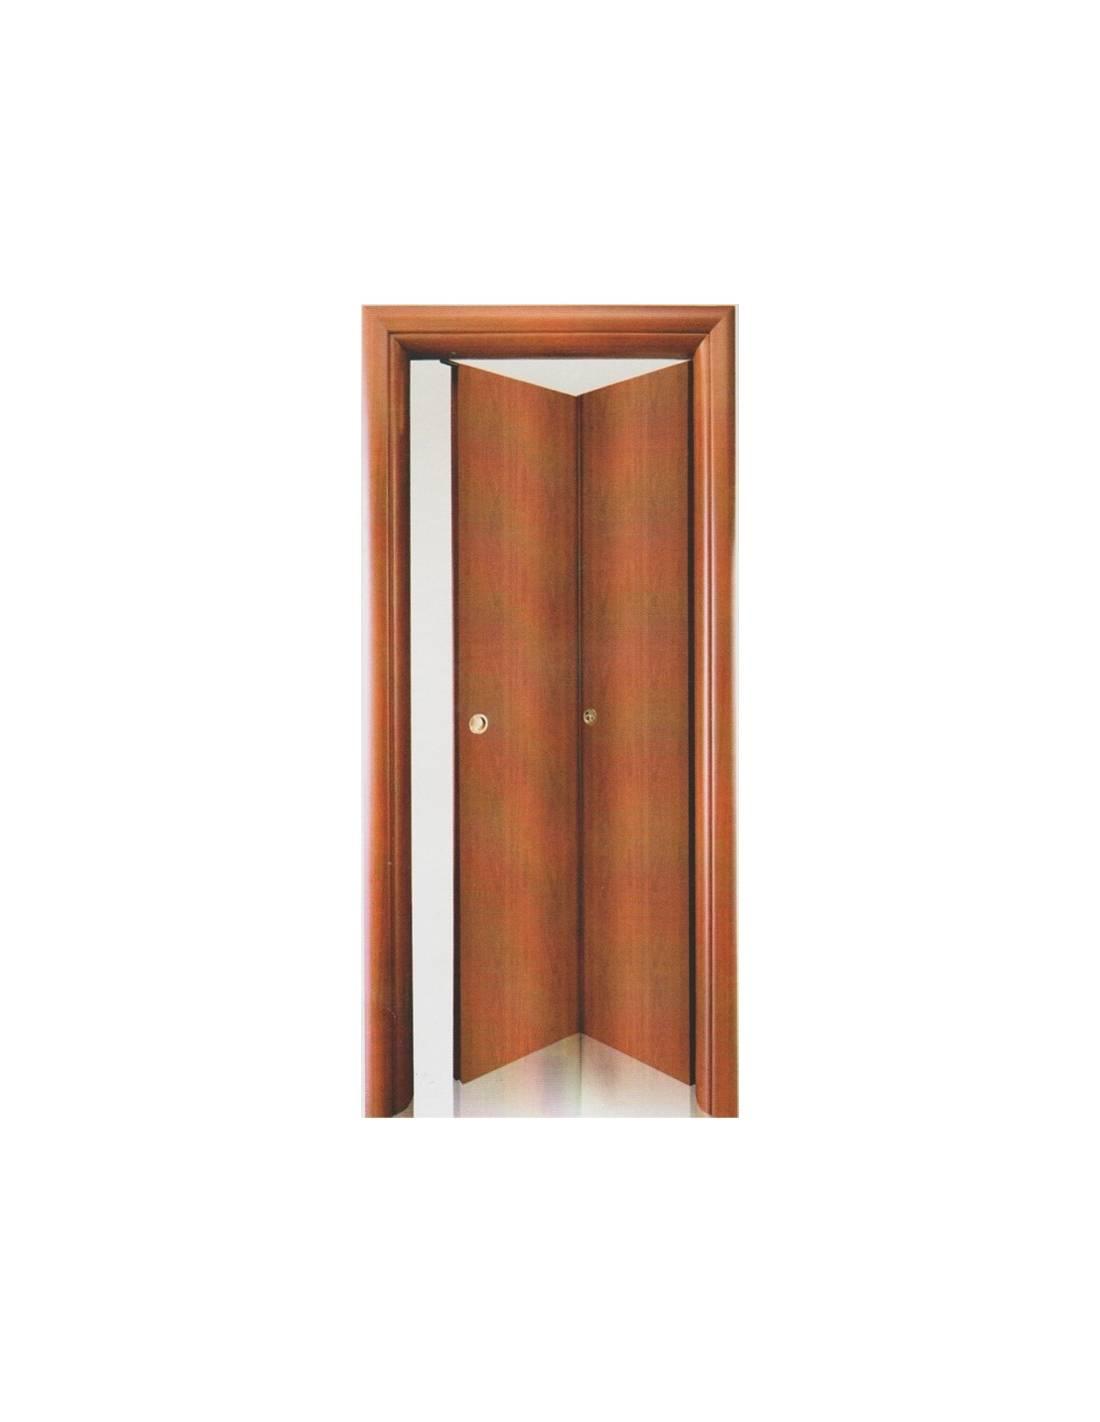 Porta mara tamburata in laminato telaio e profili bombati - Porta tamburata legno ...